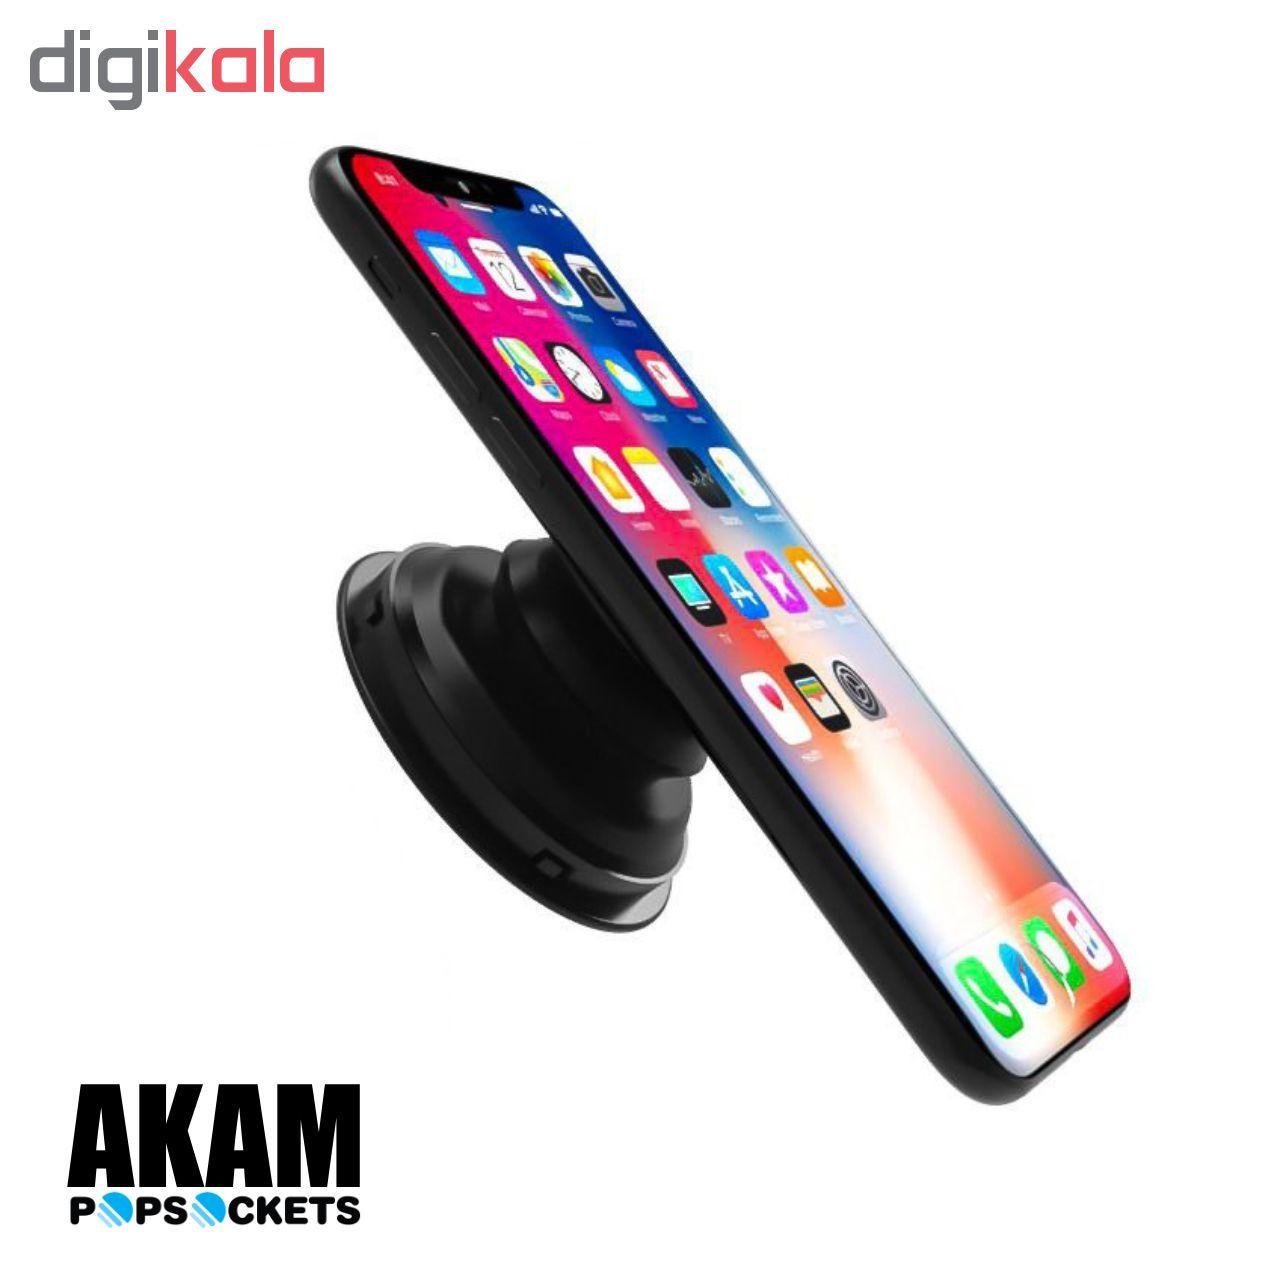 پایه نگهدارنده گوشی موبایل پاپ سوکت آکام مدل APS0054 main 1 7